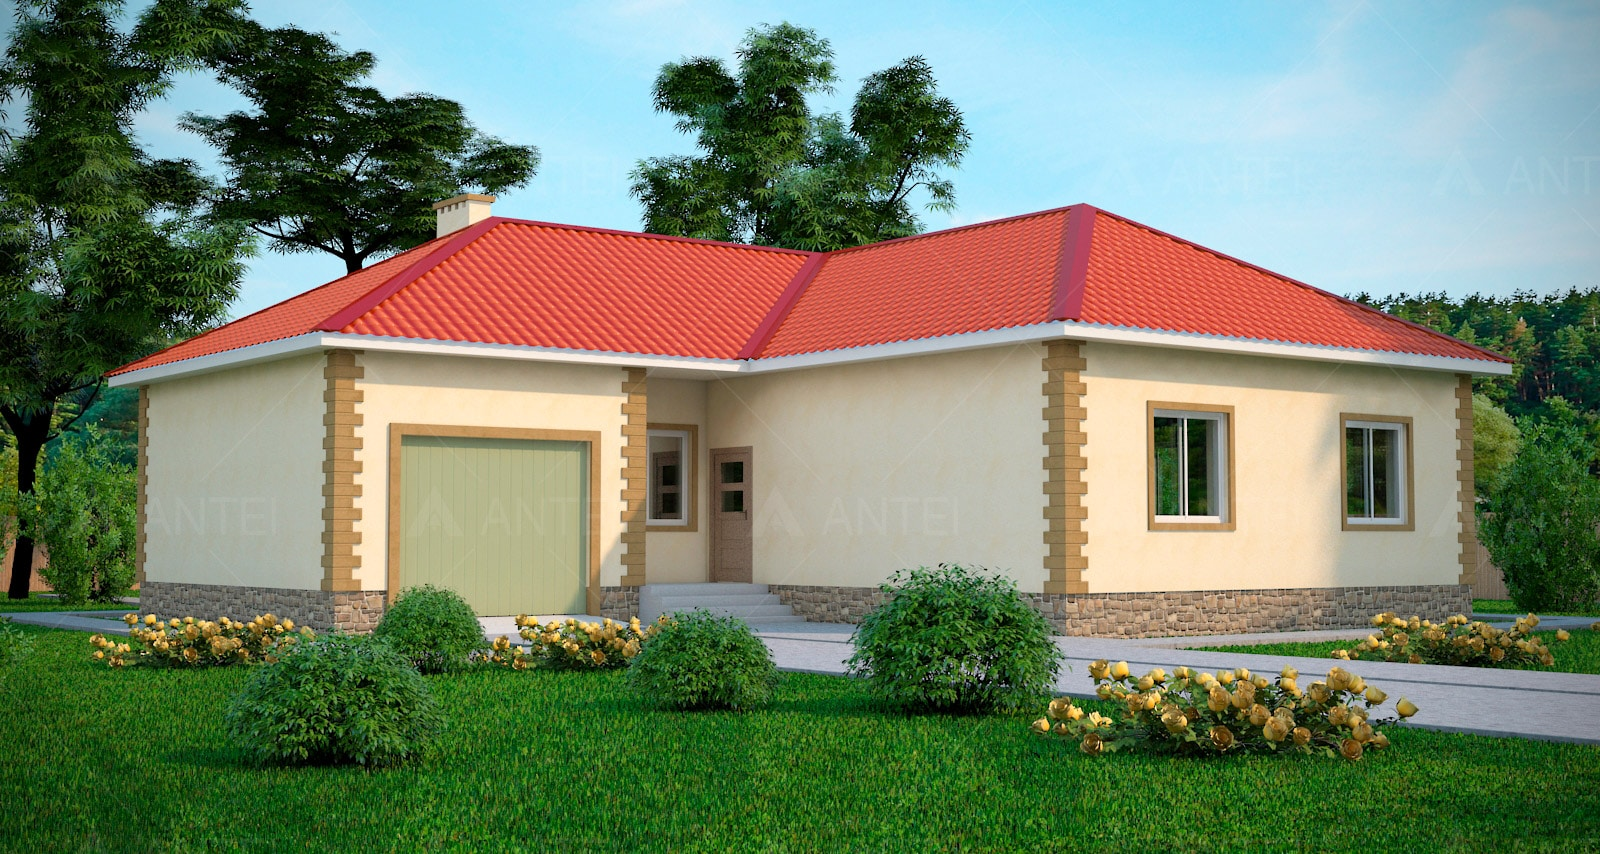 Проект одноэтажного дома с гаражом «КО-47» - фото №2